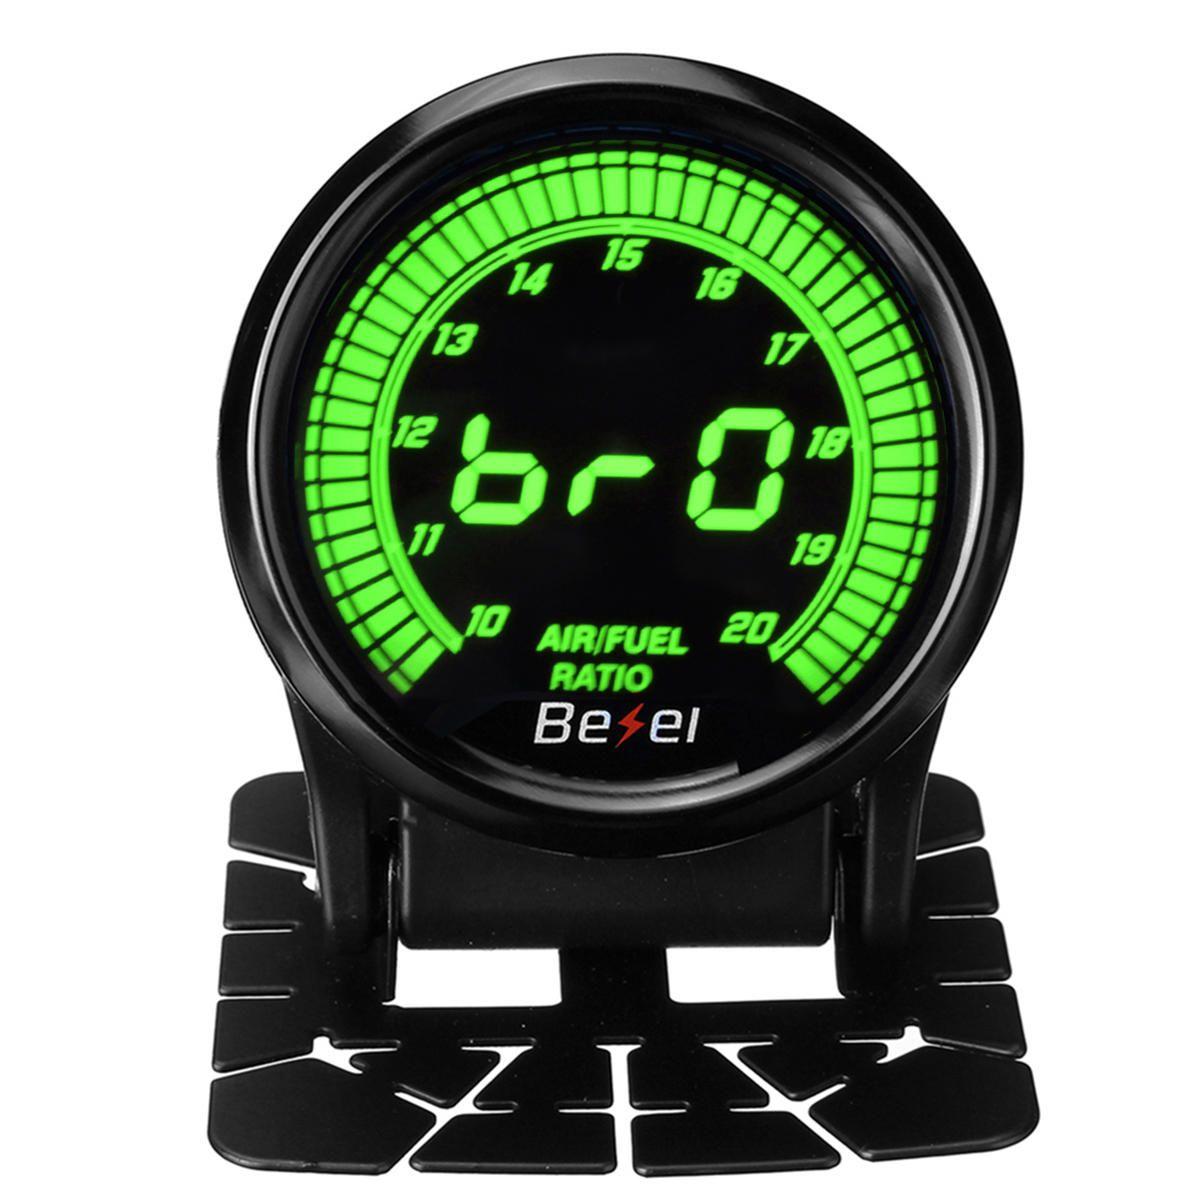 EVO 2 52mm Car Auto Air / Fuel Ratio Gauge Meter AFR Digital LED Display Black Face